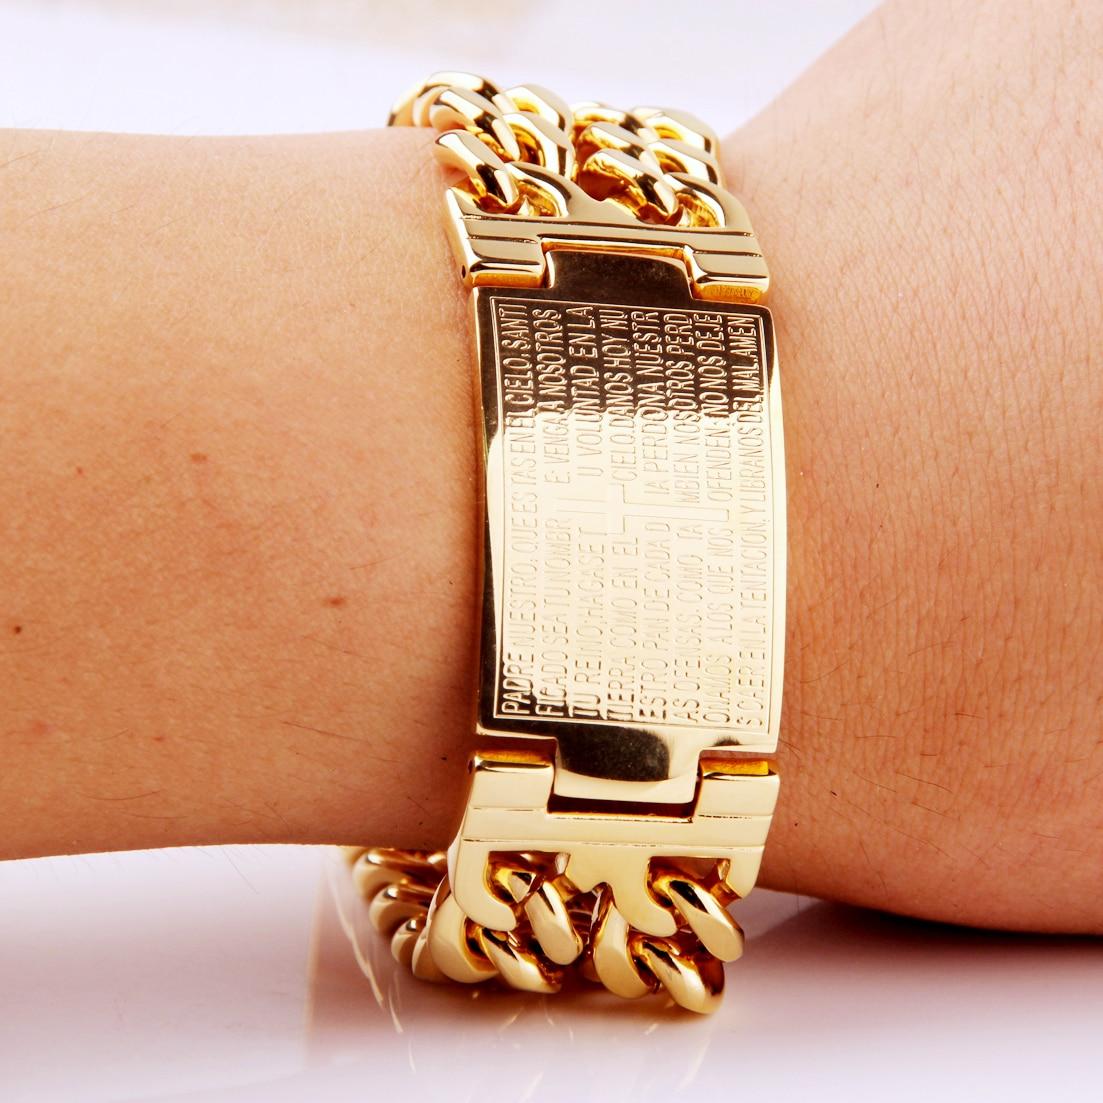 Fashion 22 5mm Heavy Men Jewelry 316L Stainless Steel Silver Gold Greece Bible Cross ID Cowboy Chain Bracelet in Chain Link Bracelets from Jewelry Accessories